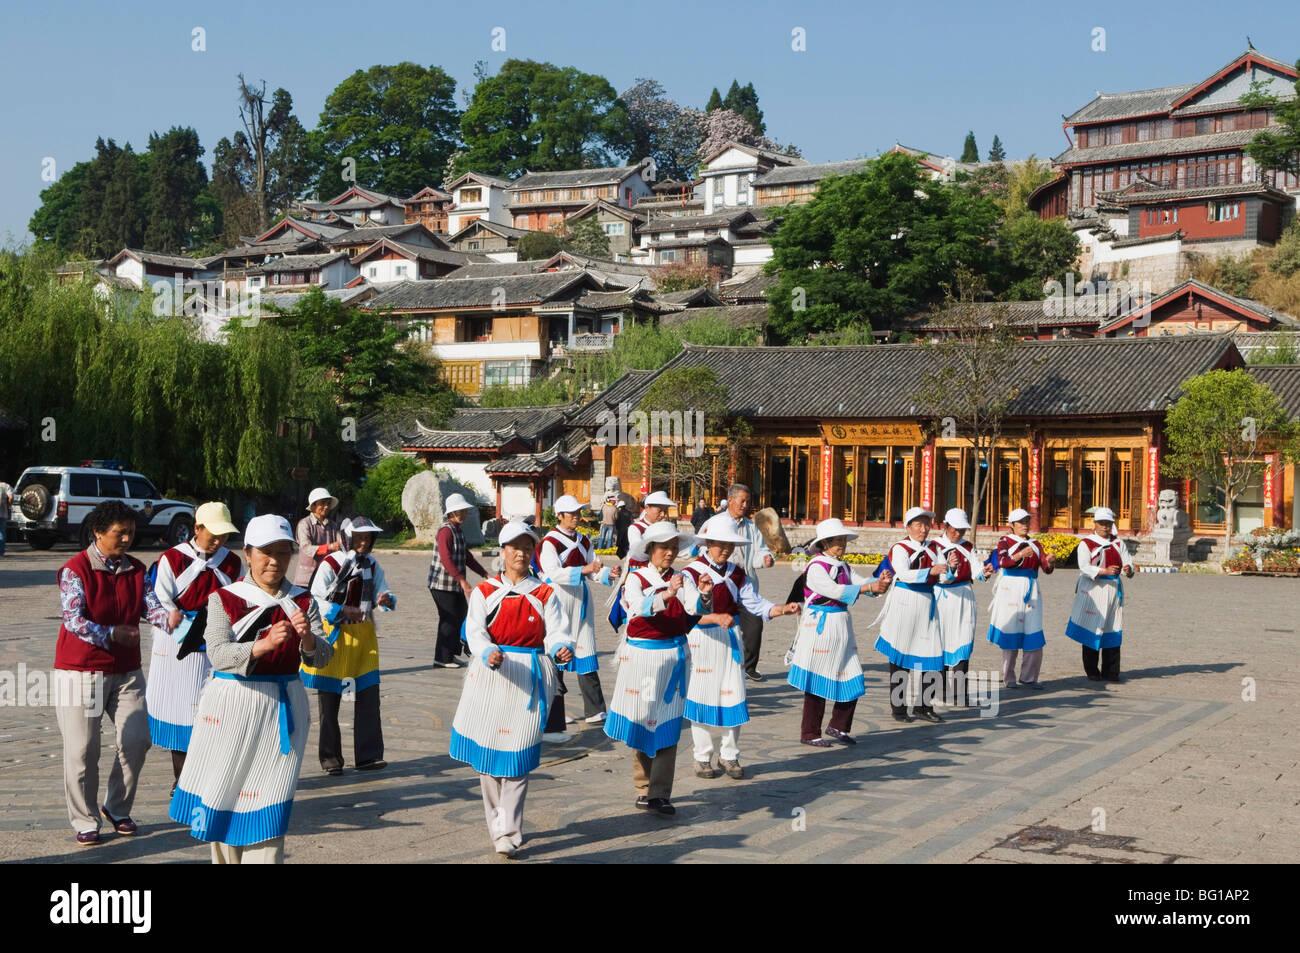 Naxi women dancing in Lijiang Old Town, UNESCO World Heritage Site, Yunnan Province, China, Asia - Stock Image